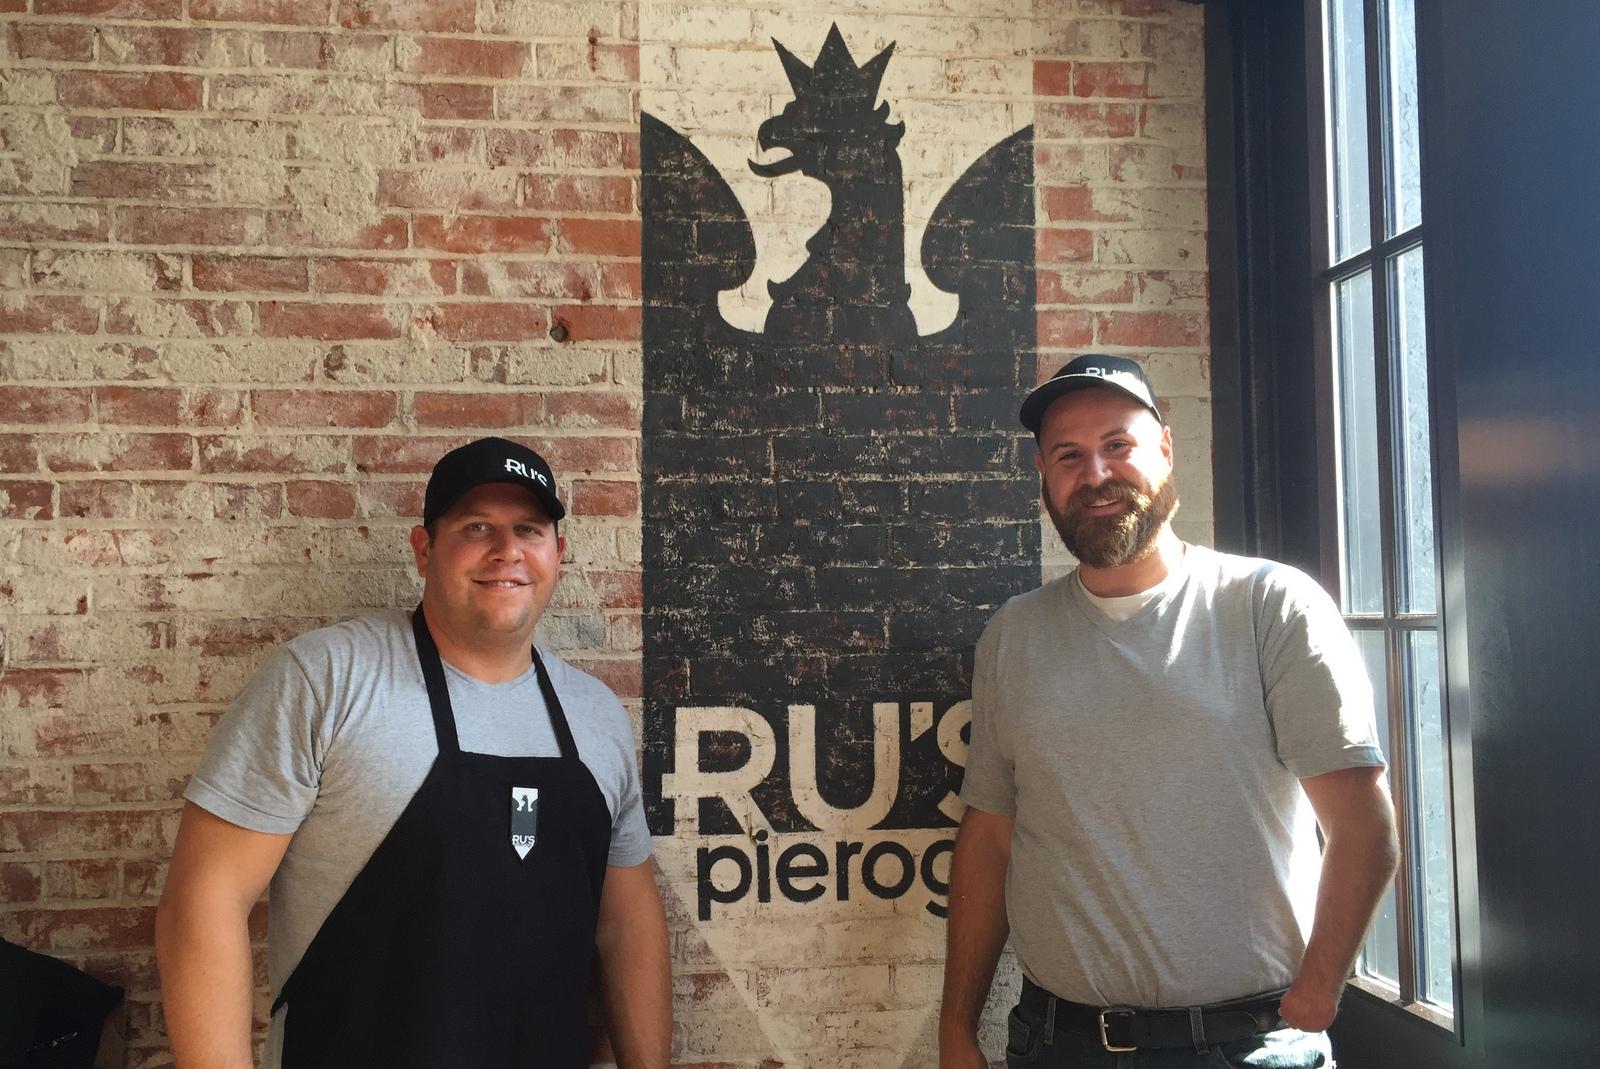 Andy Ruszczyk, left, and Zachary Schneider of Ru's Pierogi. (Andrew Galarneau/Buffalo News)